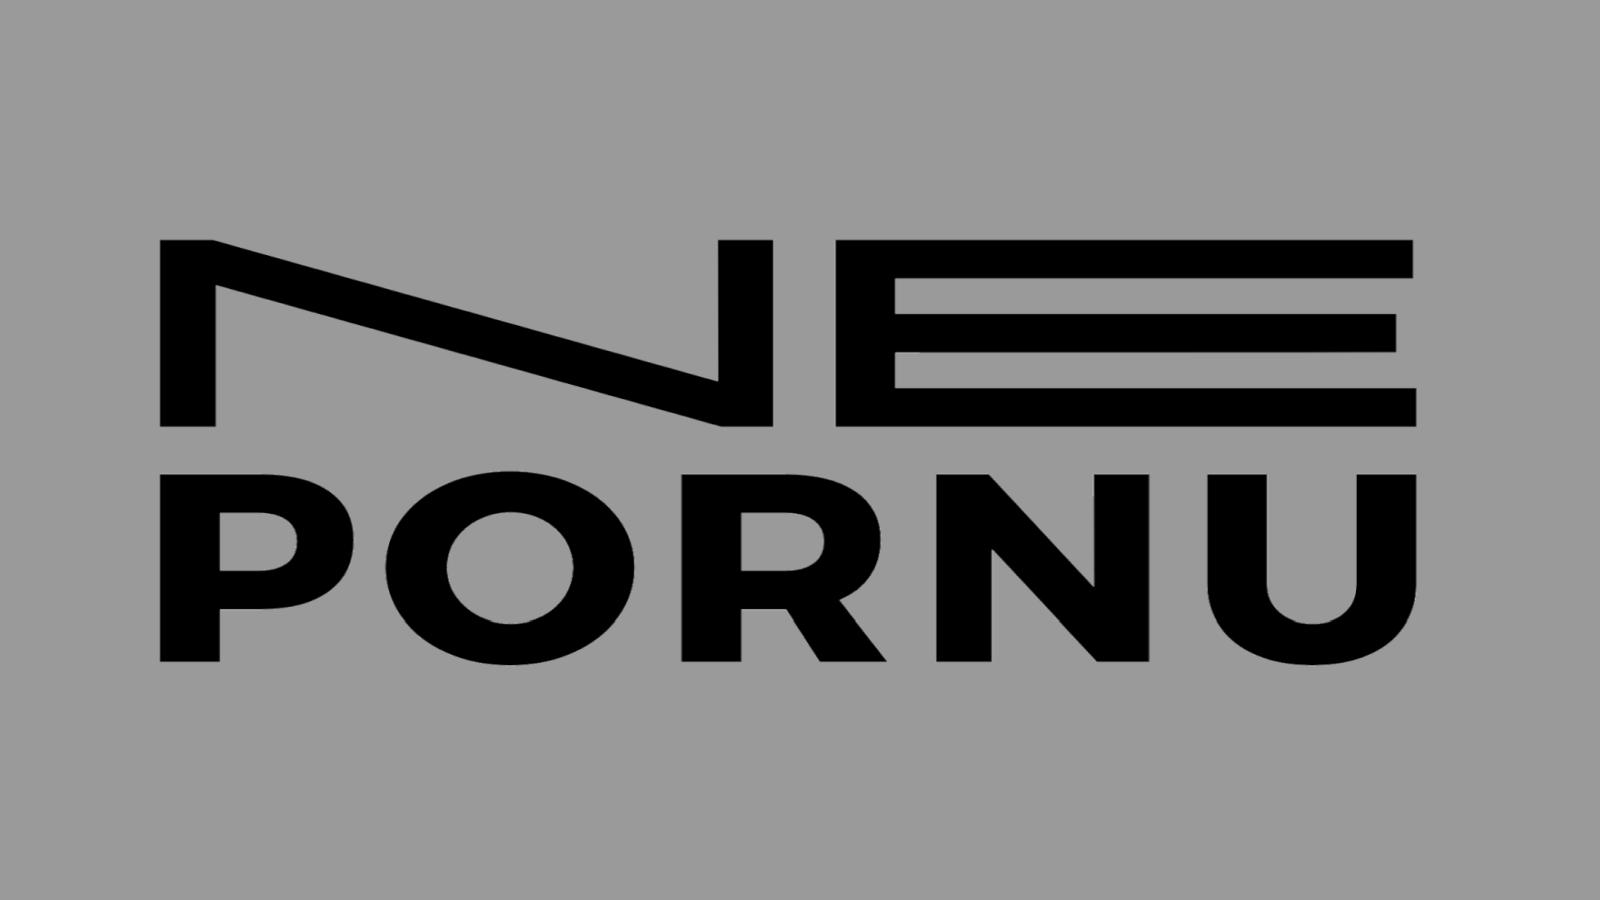 NePornu logo.png